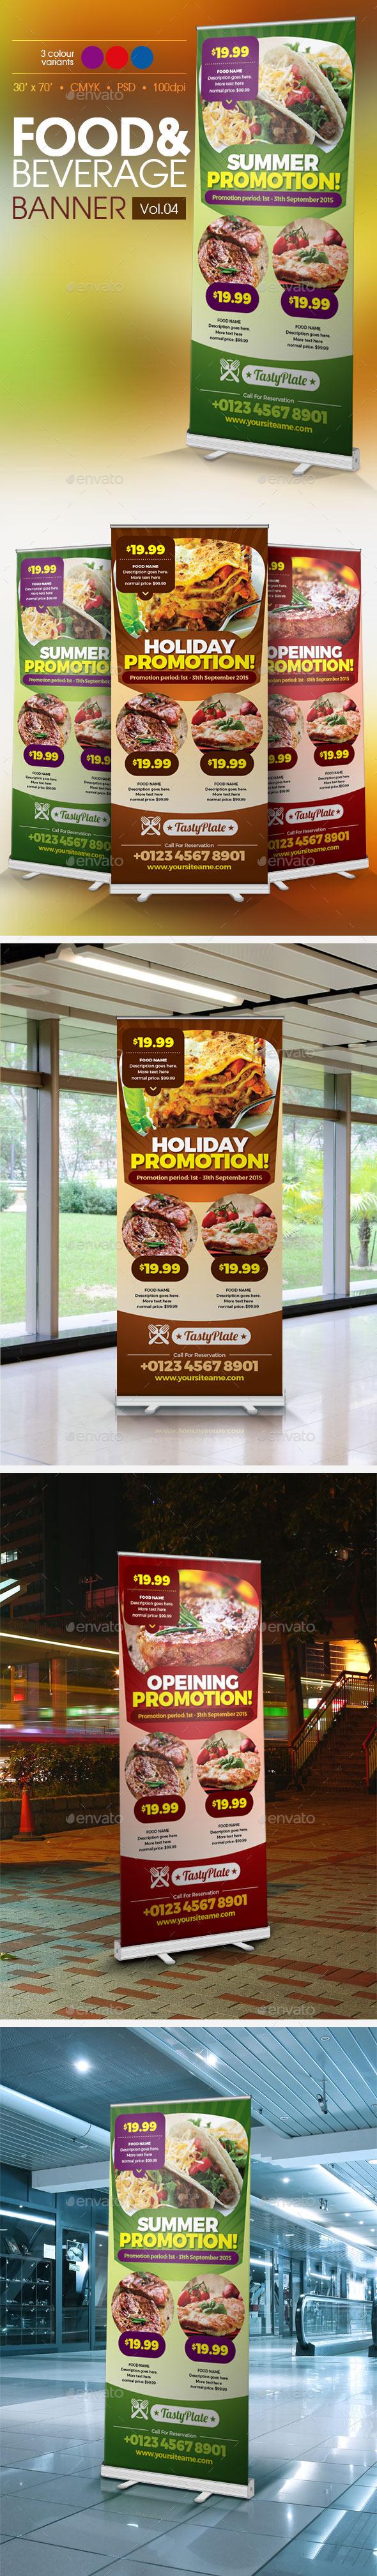 Restaurant Banner Vol.4 - Signage Print Templates